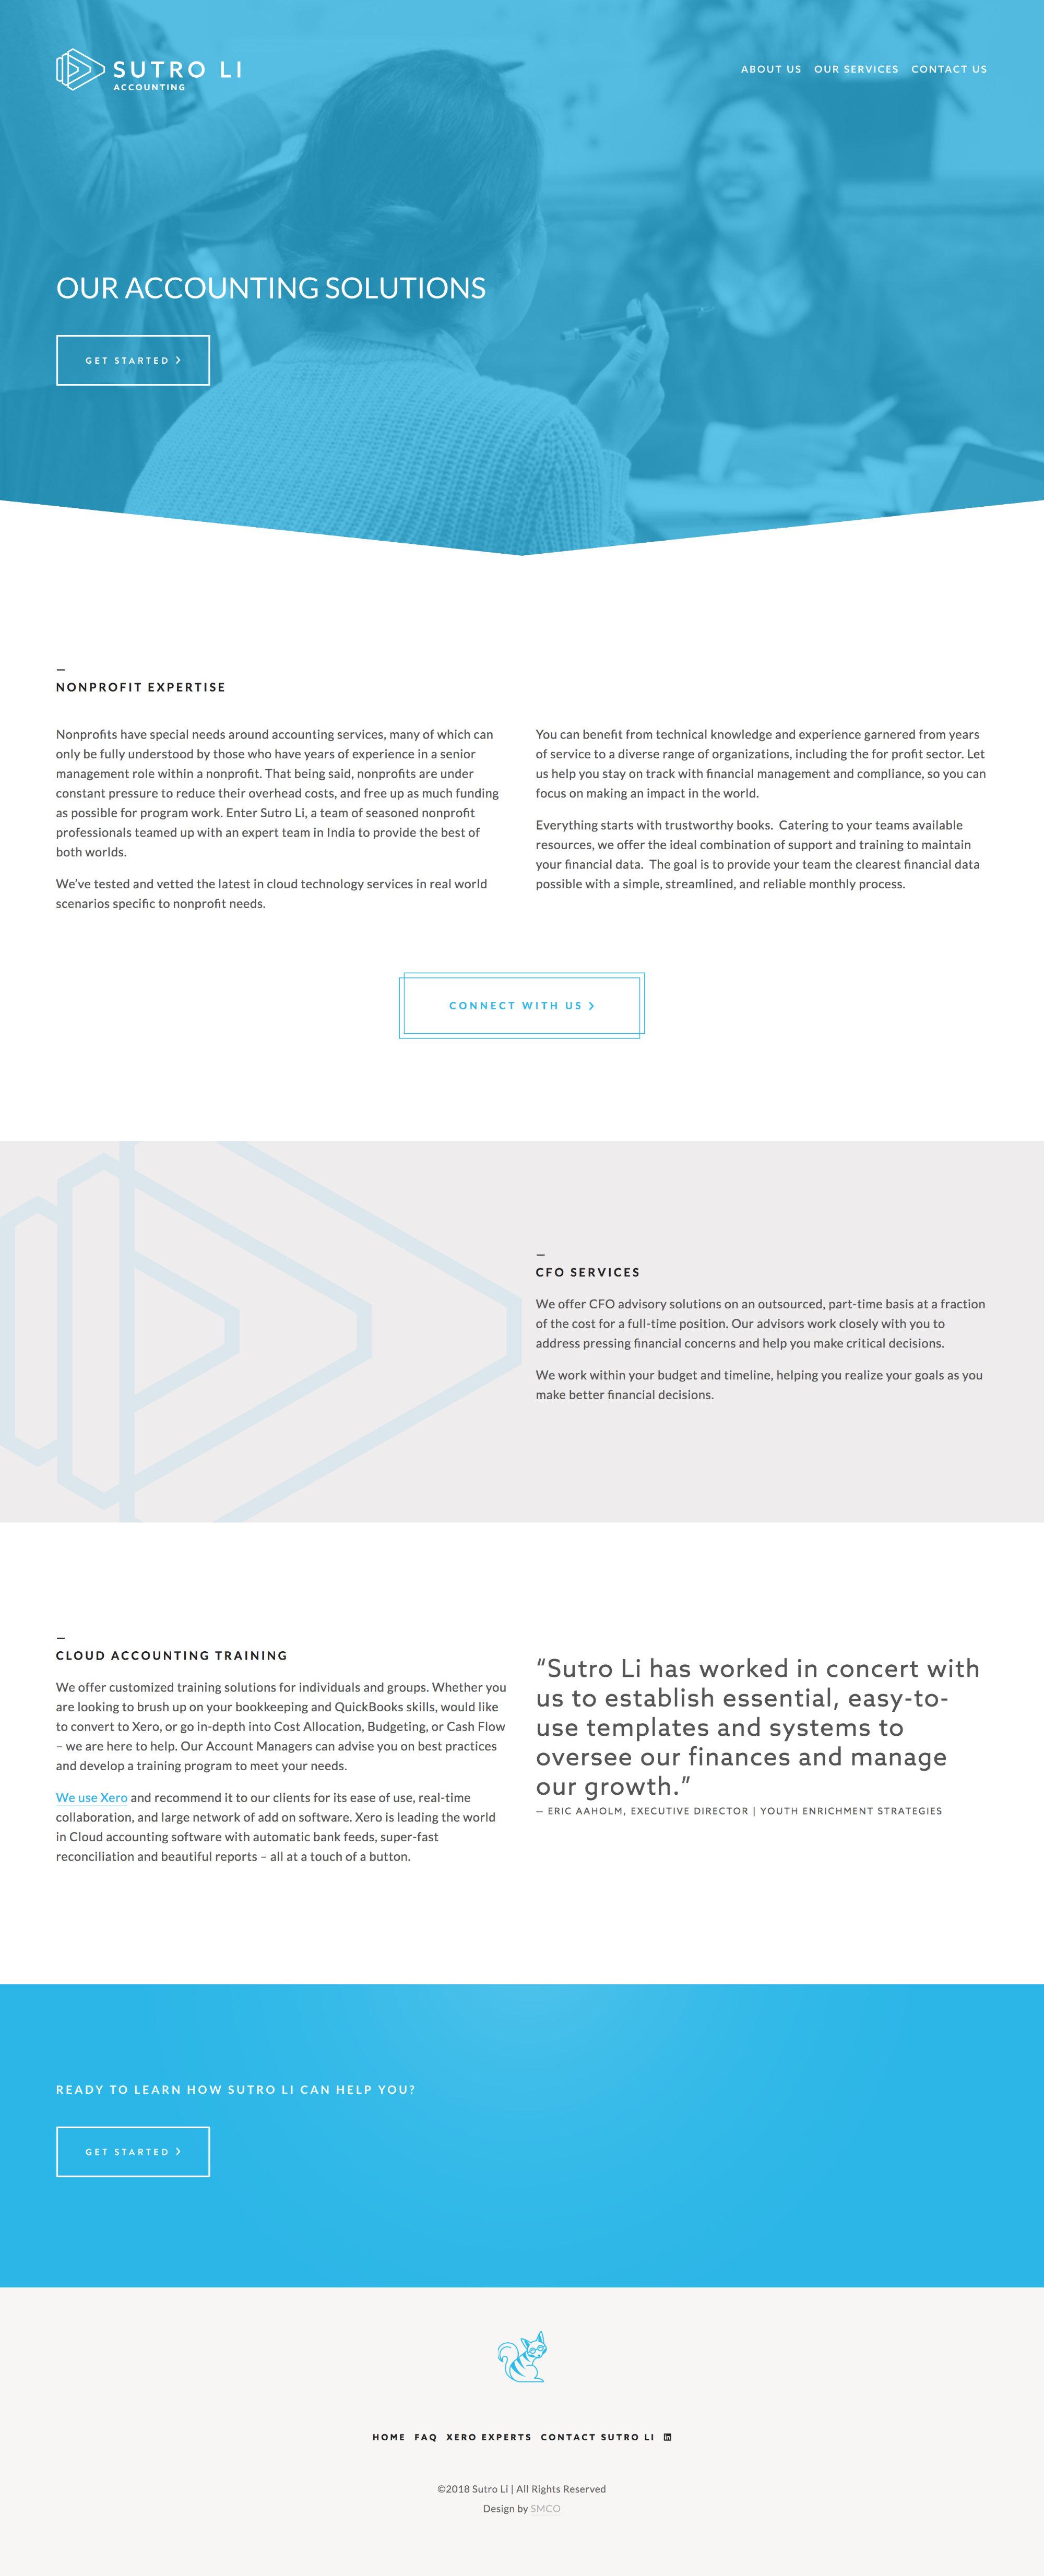 screencapture-sutroli-our-accounting-solutions-2018-06-10-21_25_53.jpg